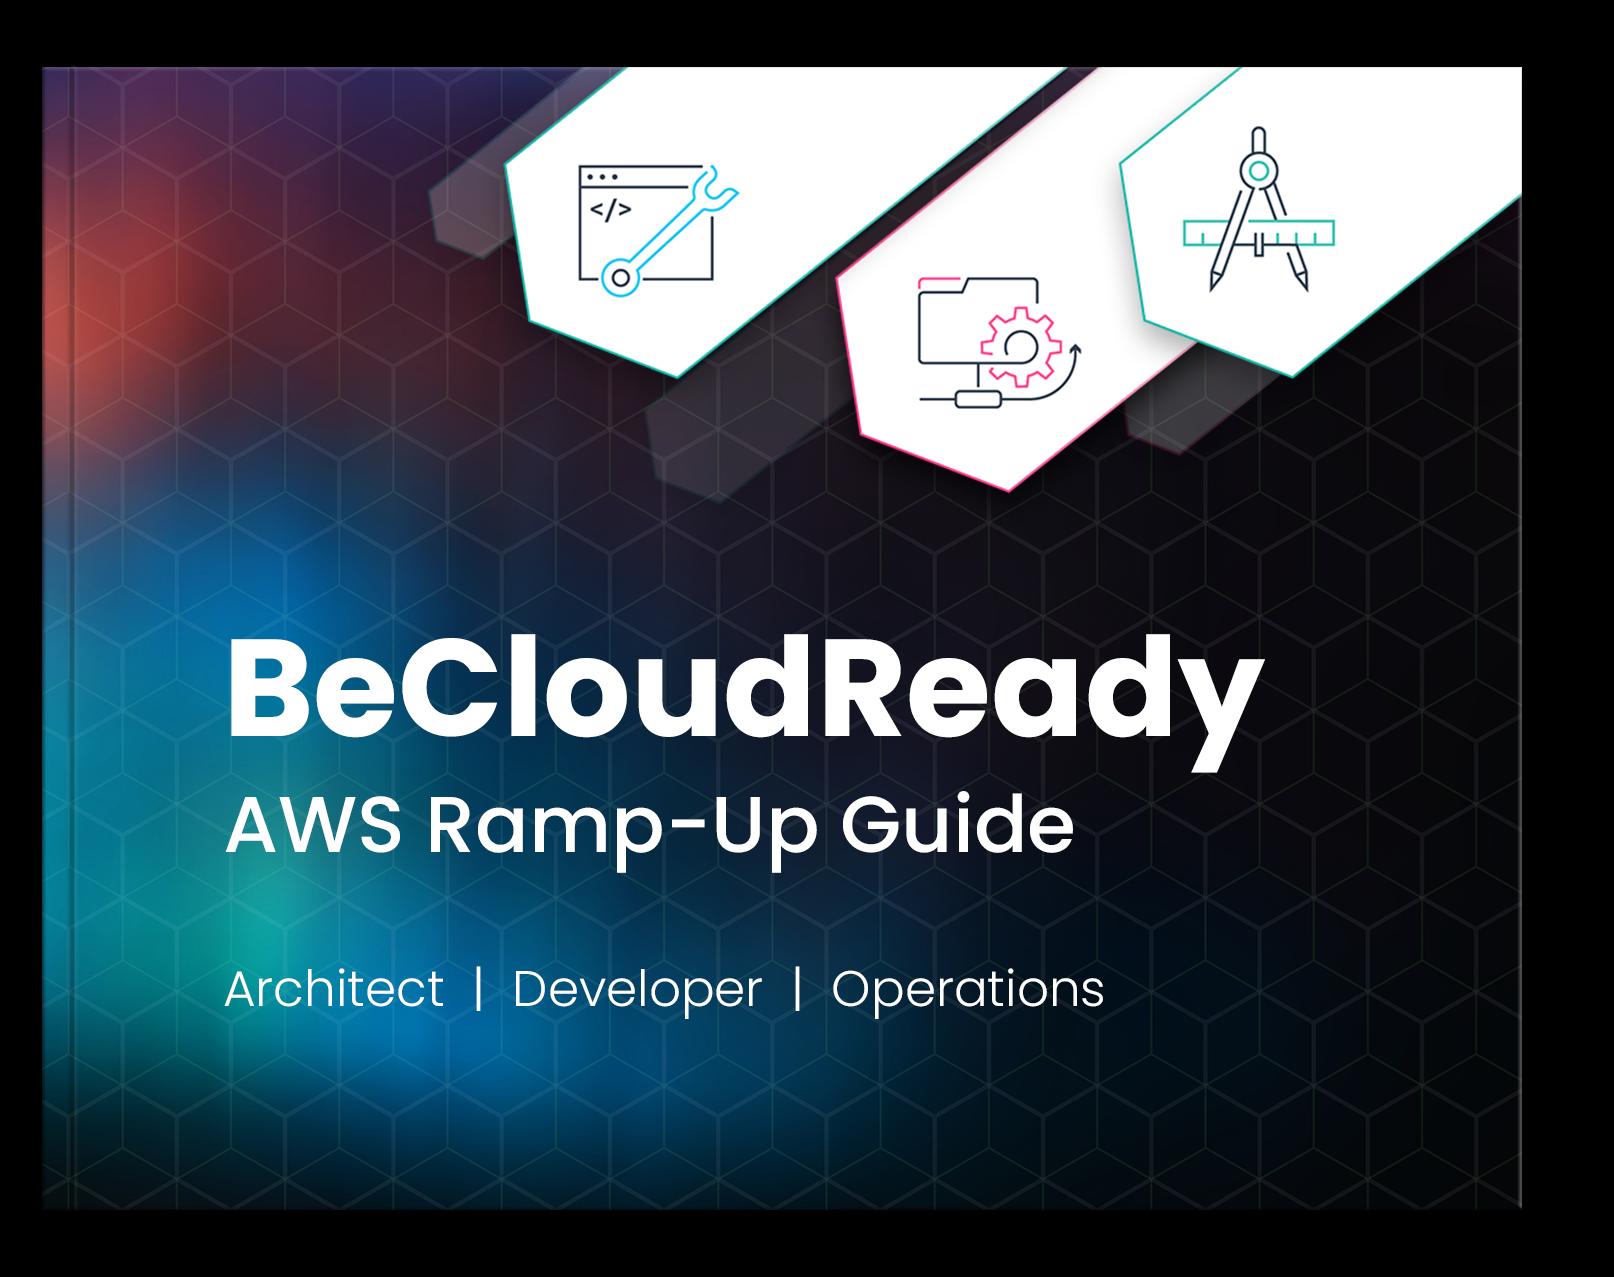 AWS Ramp-Up Guides